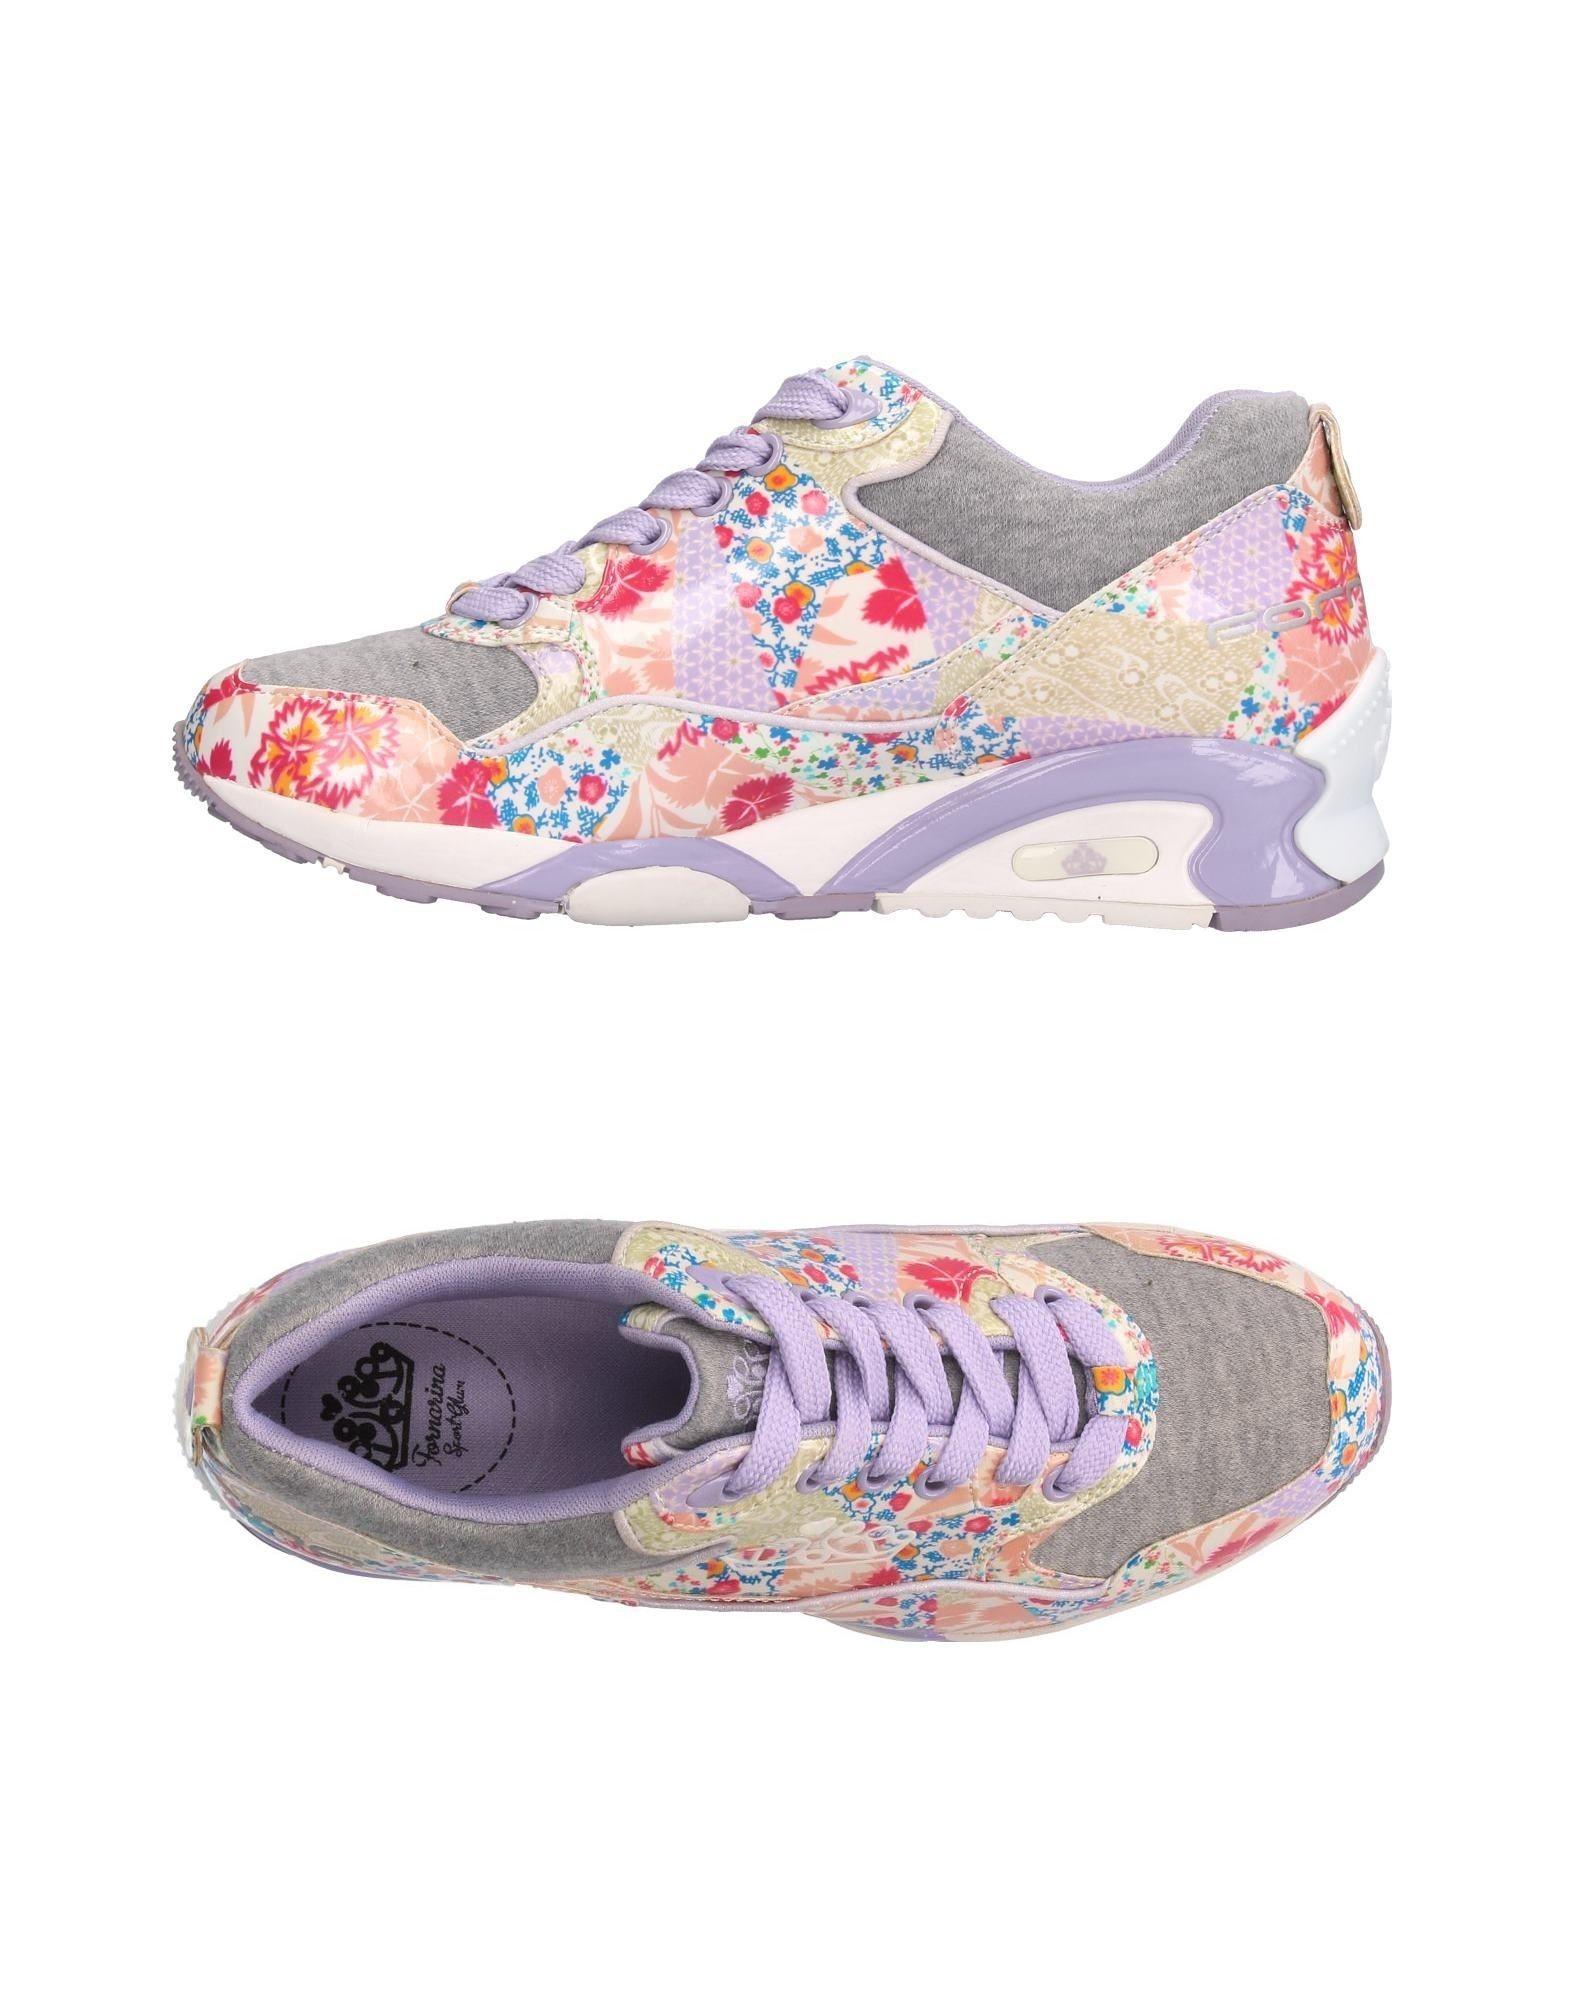 Fornarina Schuhe Sportglam Sneakers Damen  11202041MI Gute Qualität beliebte Schuhe Fornarina 6fefdc